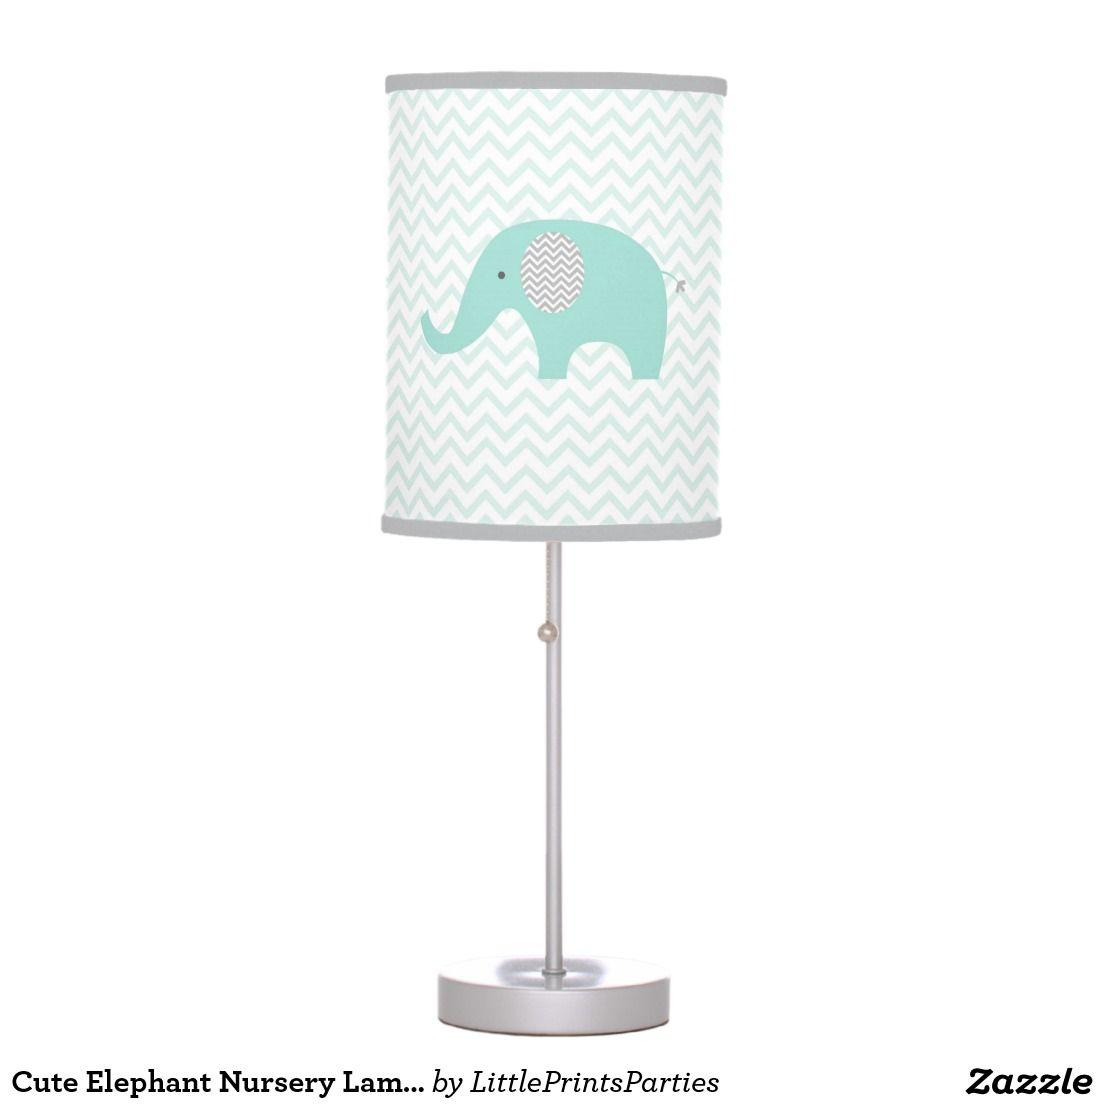 Cute Elephant Nursery Lamp Mint Green & Grey | Lamps | Pinterest